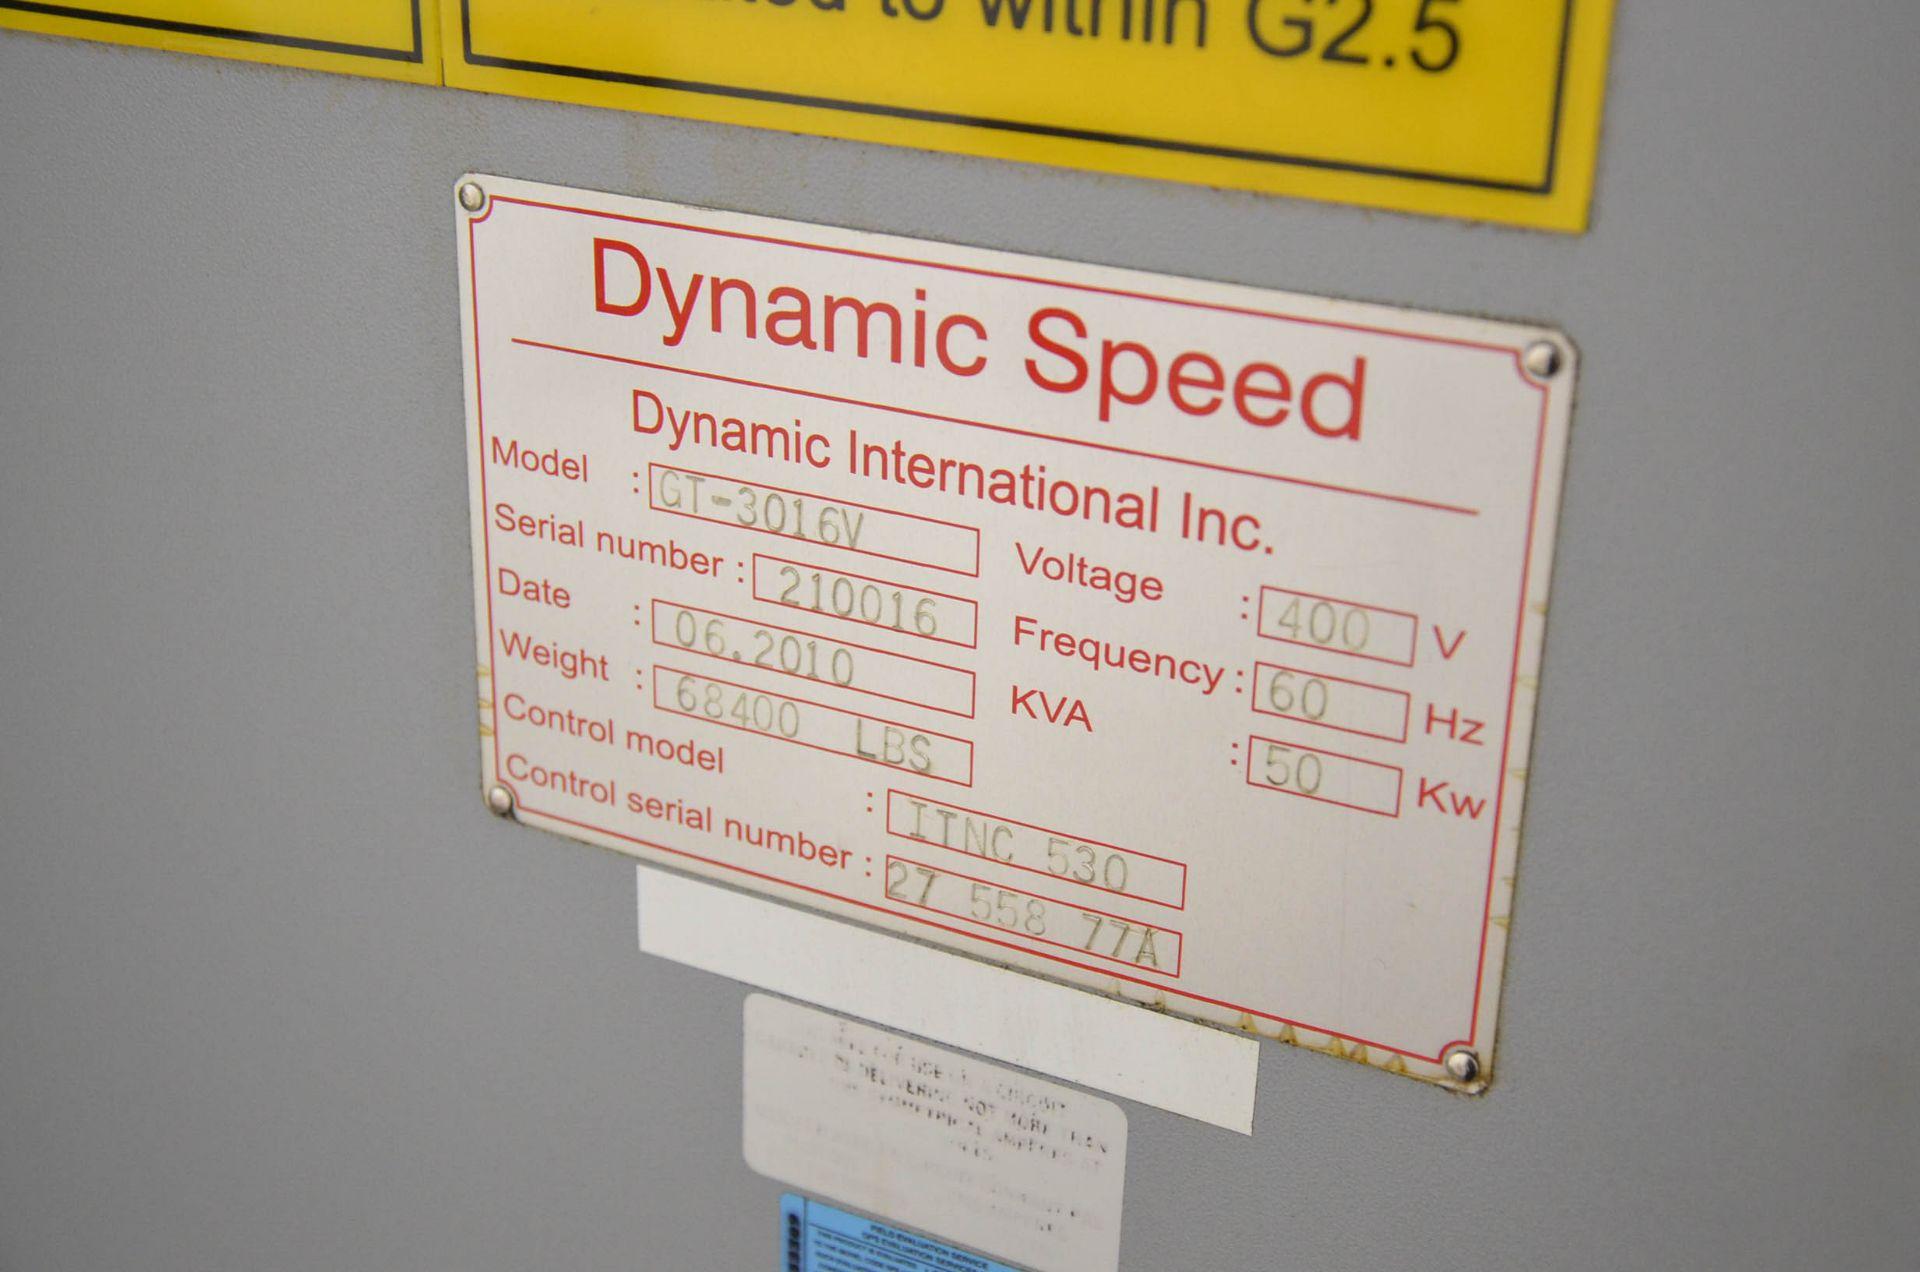 DYNAMIC SPEED (2010) GT-3016V GANTRY-TYPE VERTICAL MACHINING CENTER WITH HEIDENHAIN ITNC530 CNC - Image 11 of 12